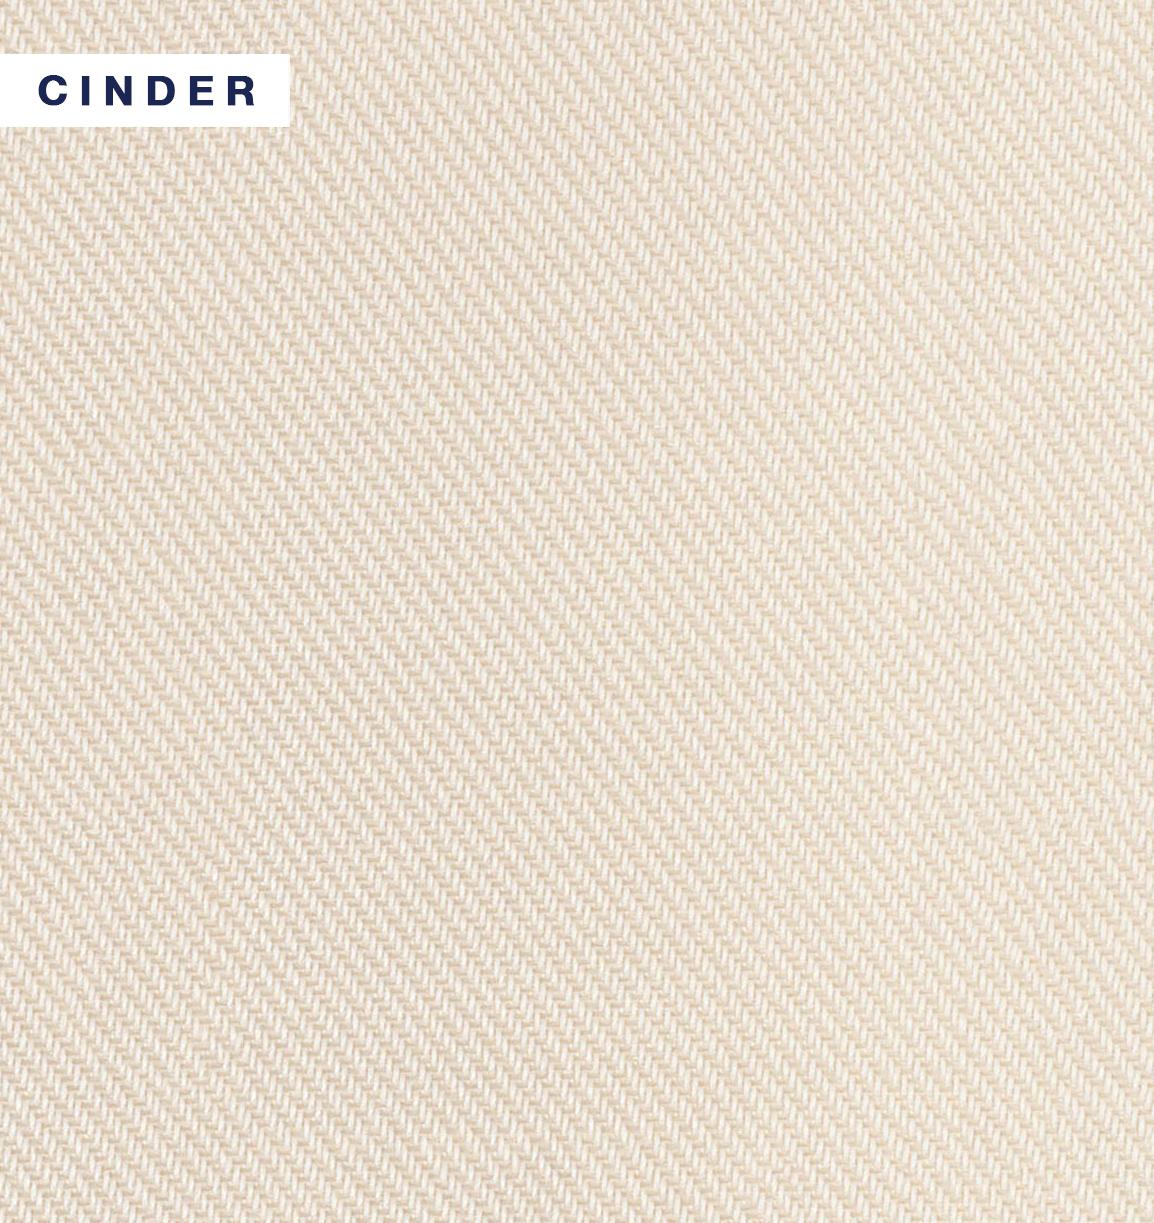 Aquila - Cinder.jpg